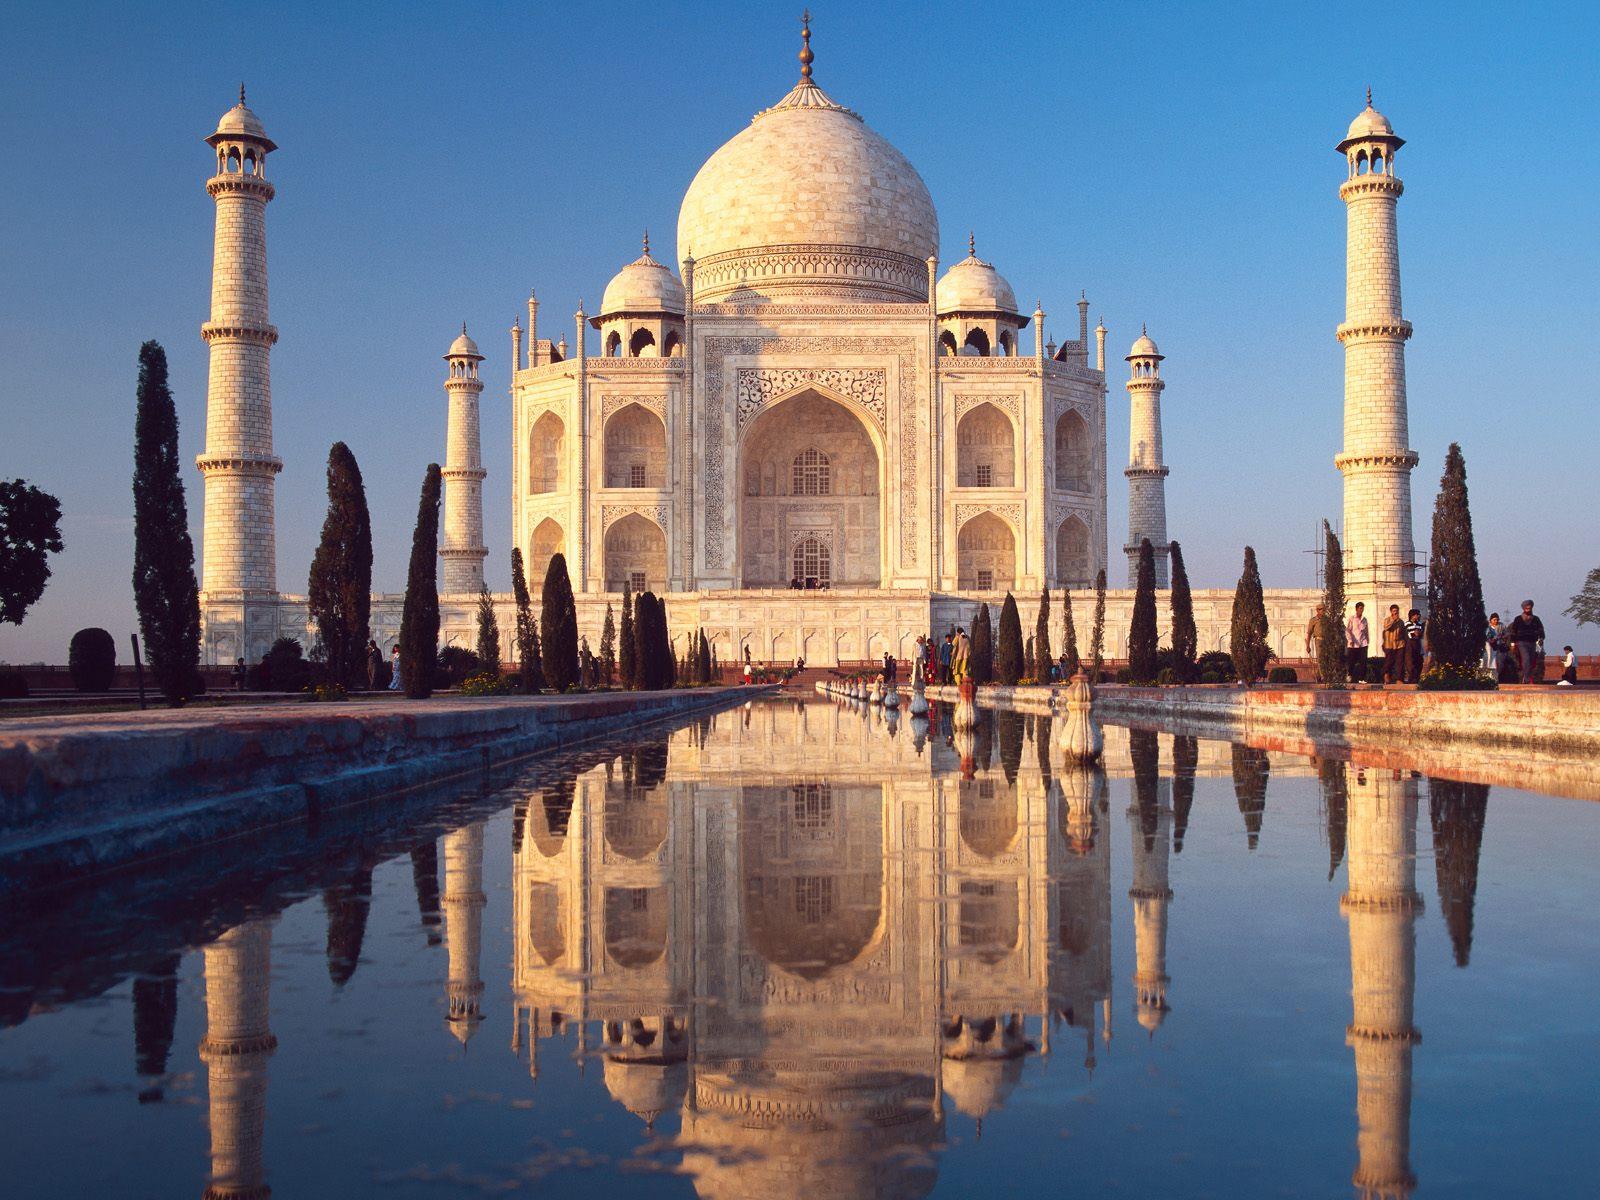 Management Guru: PEST & Trend analysis of tourism in India